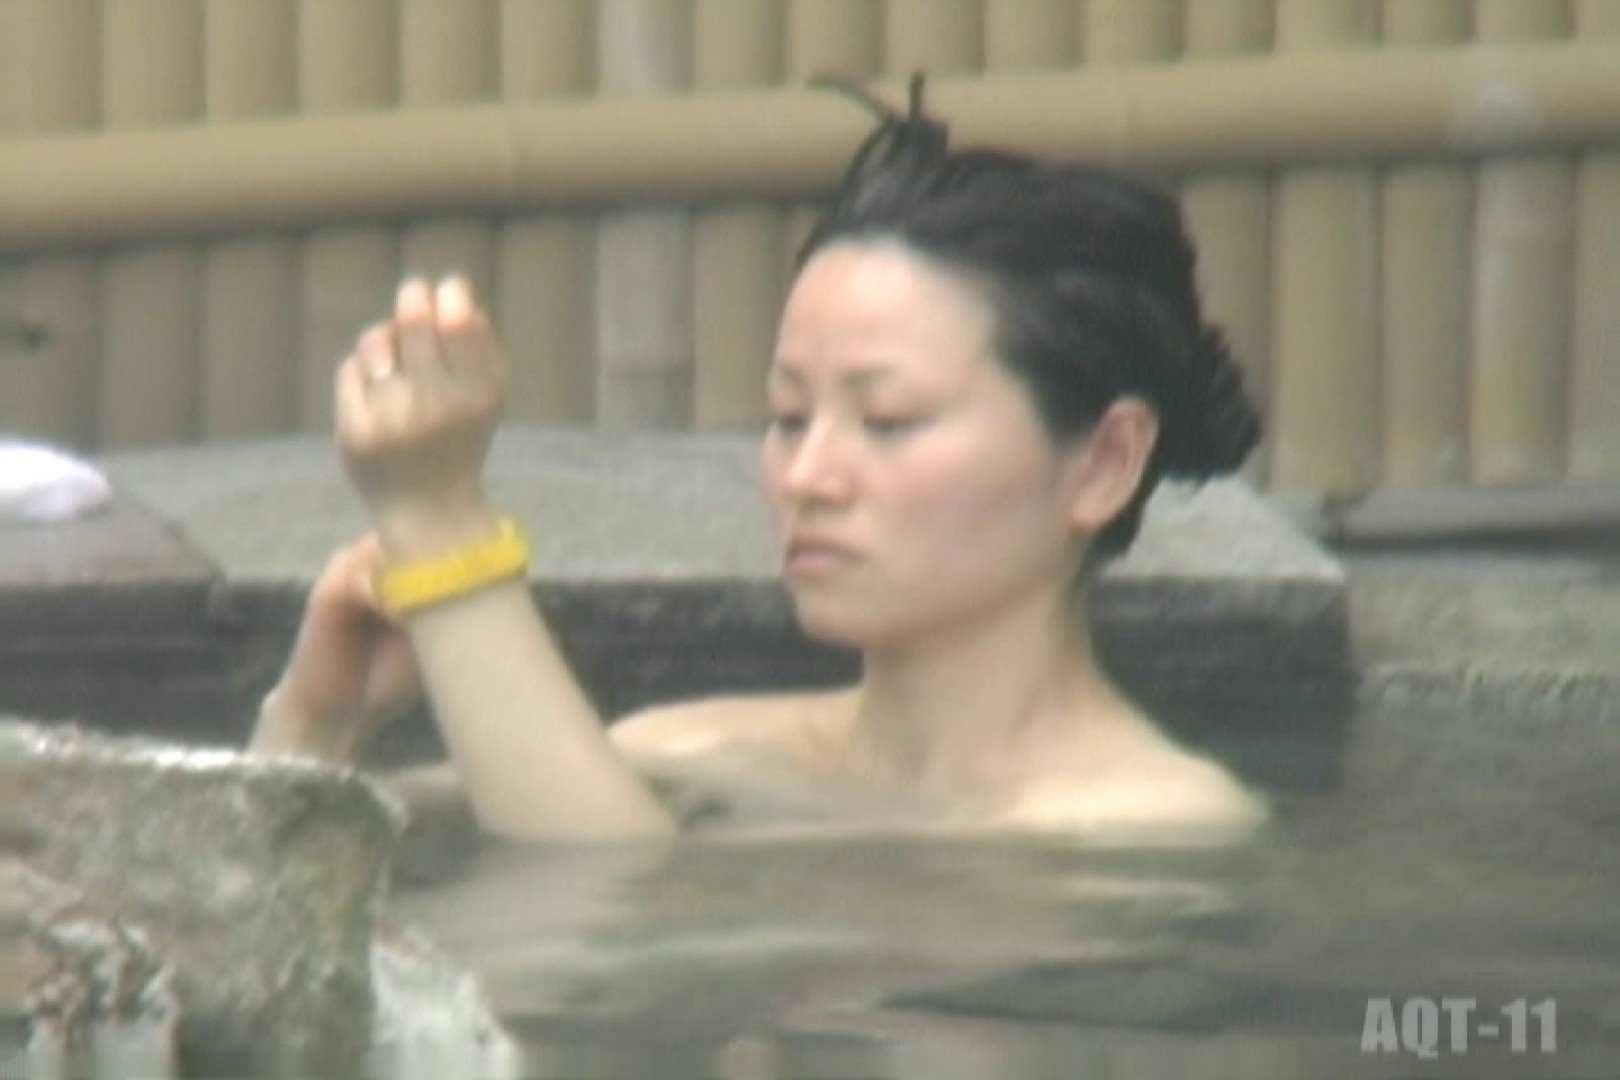 Aquaな露天風呂Vol.802 女体盗撮 盗み撮りSEX無修正画像 85連発 26